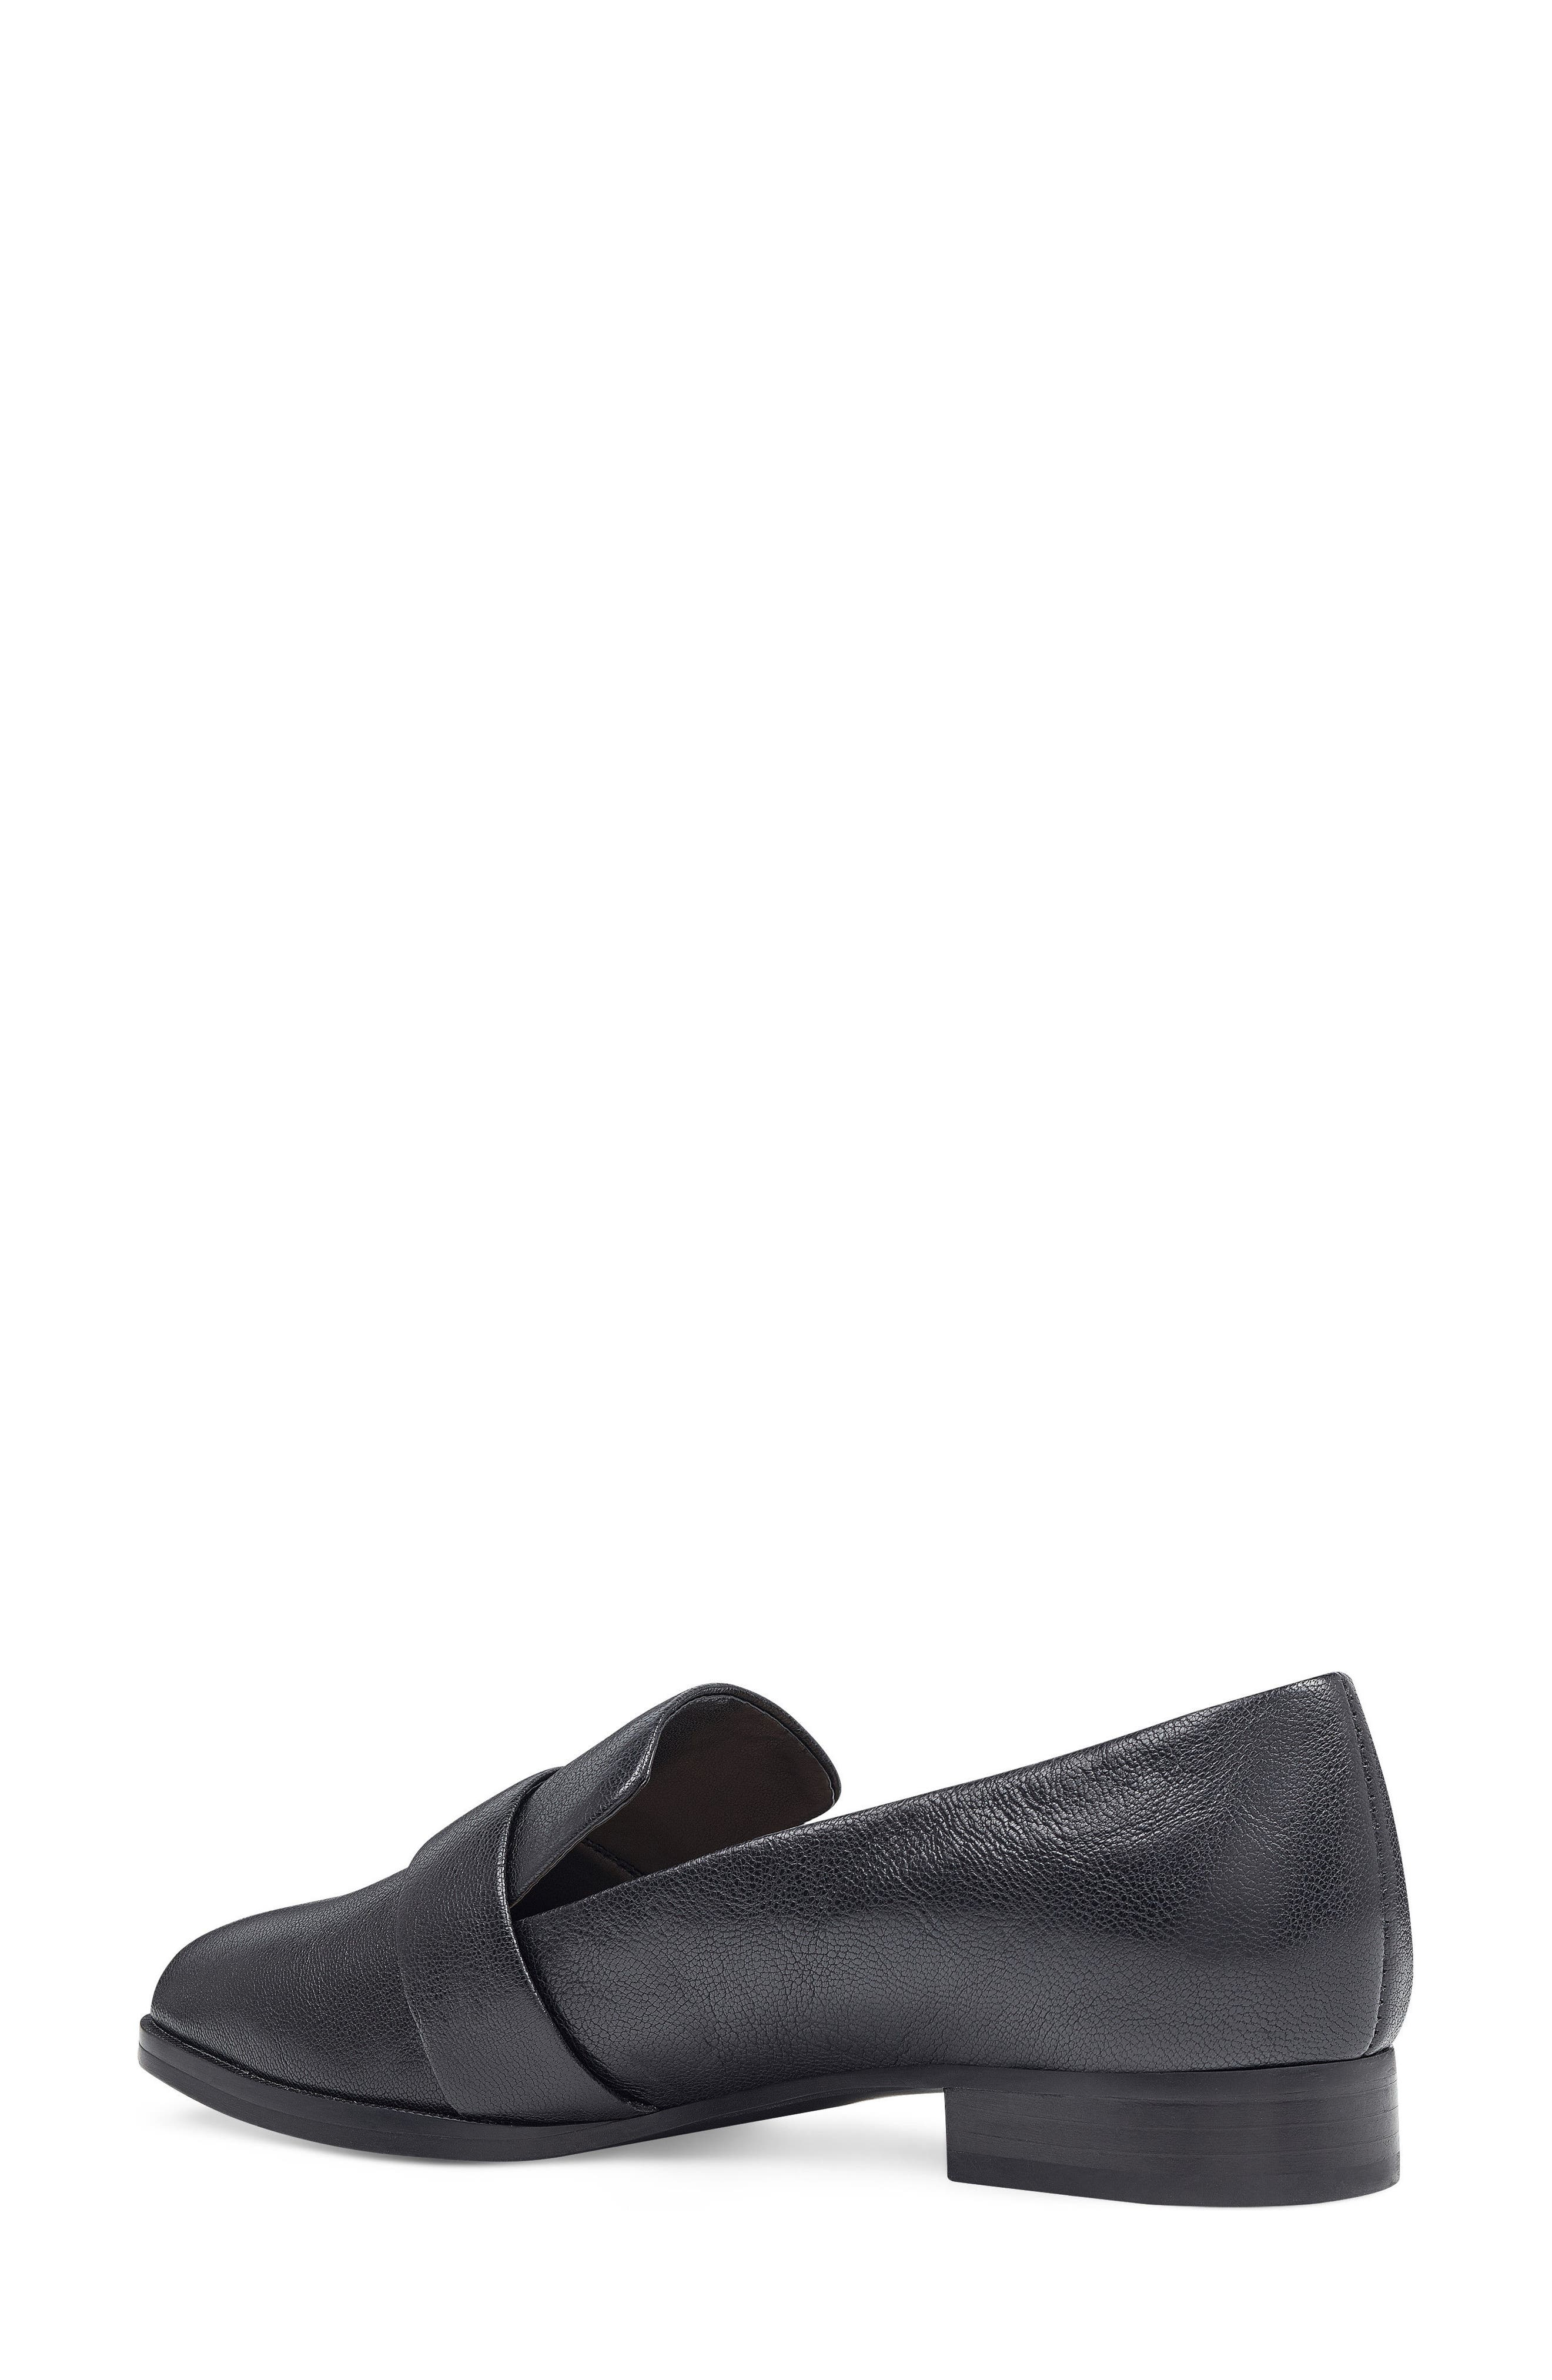 Huff Loafer Flat,                             Alternate thumbnail 2, color,                             Black Leather